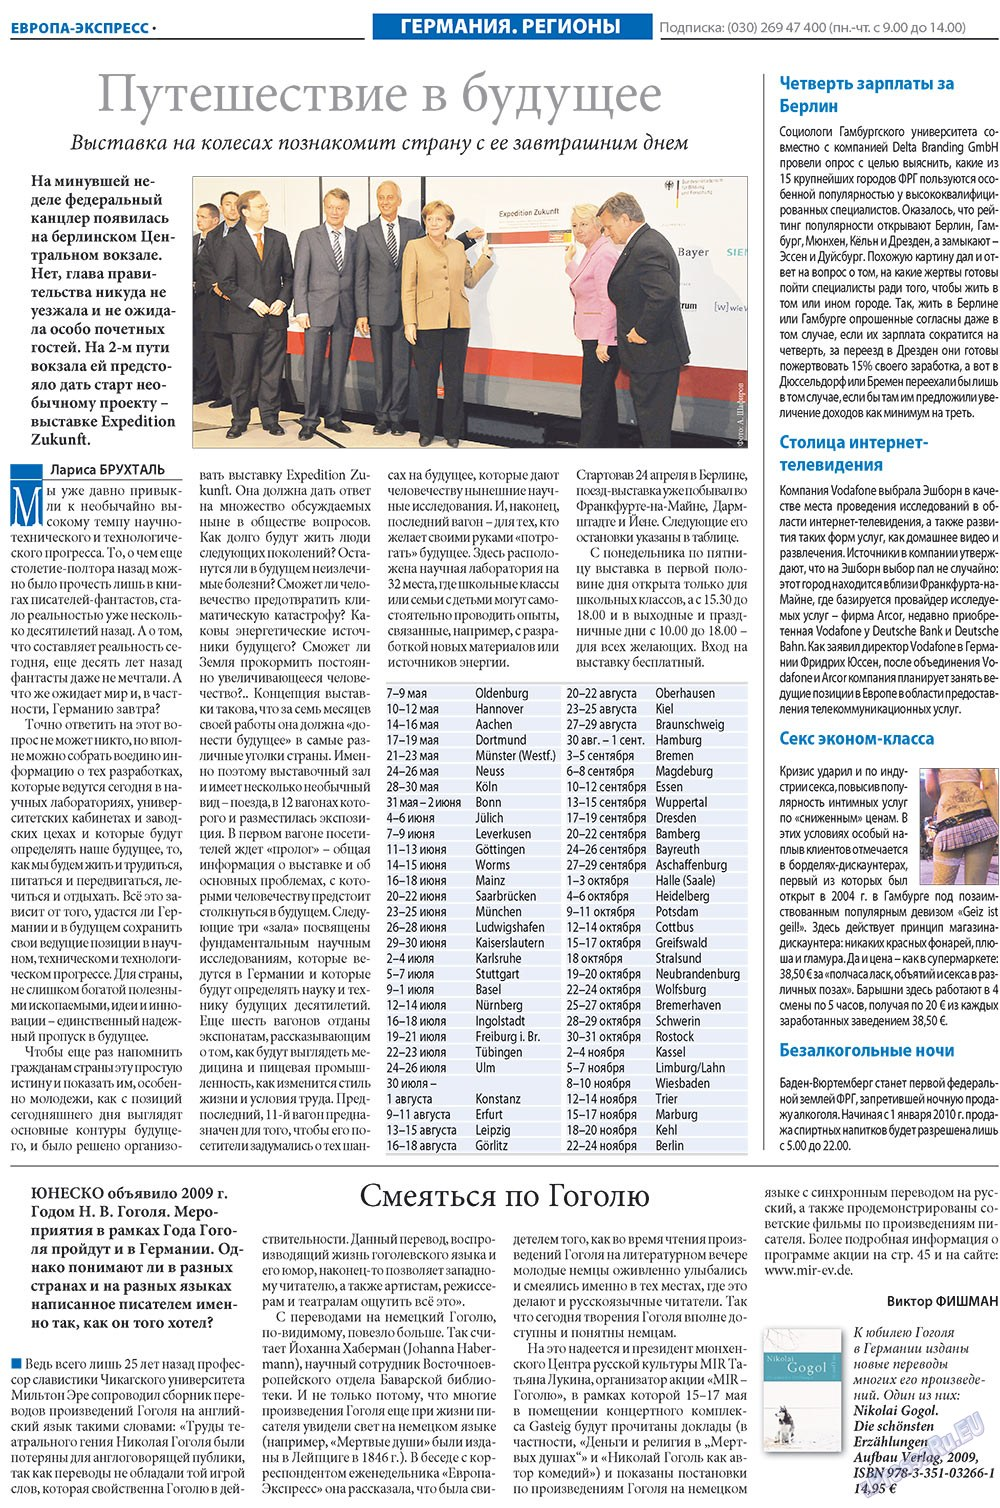 Европа экспресс (газета). 2009 год, номер 19, стр. 7